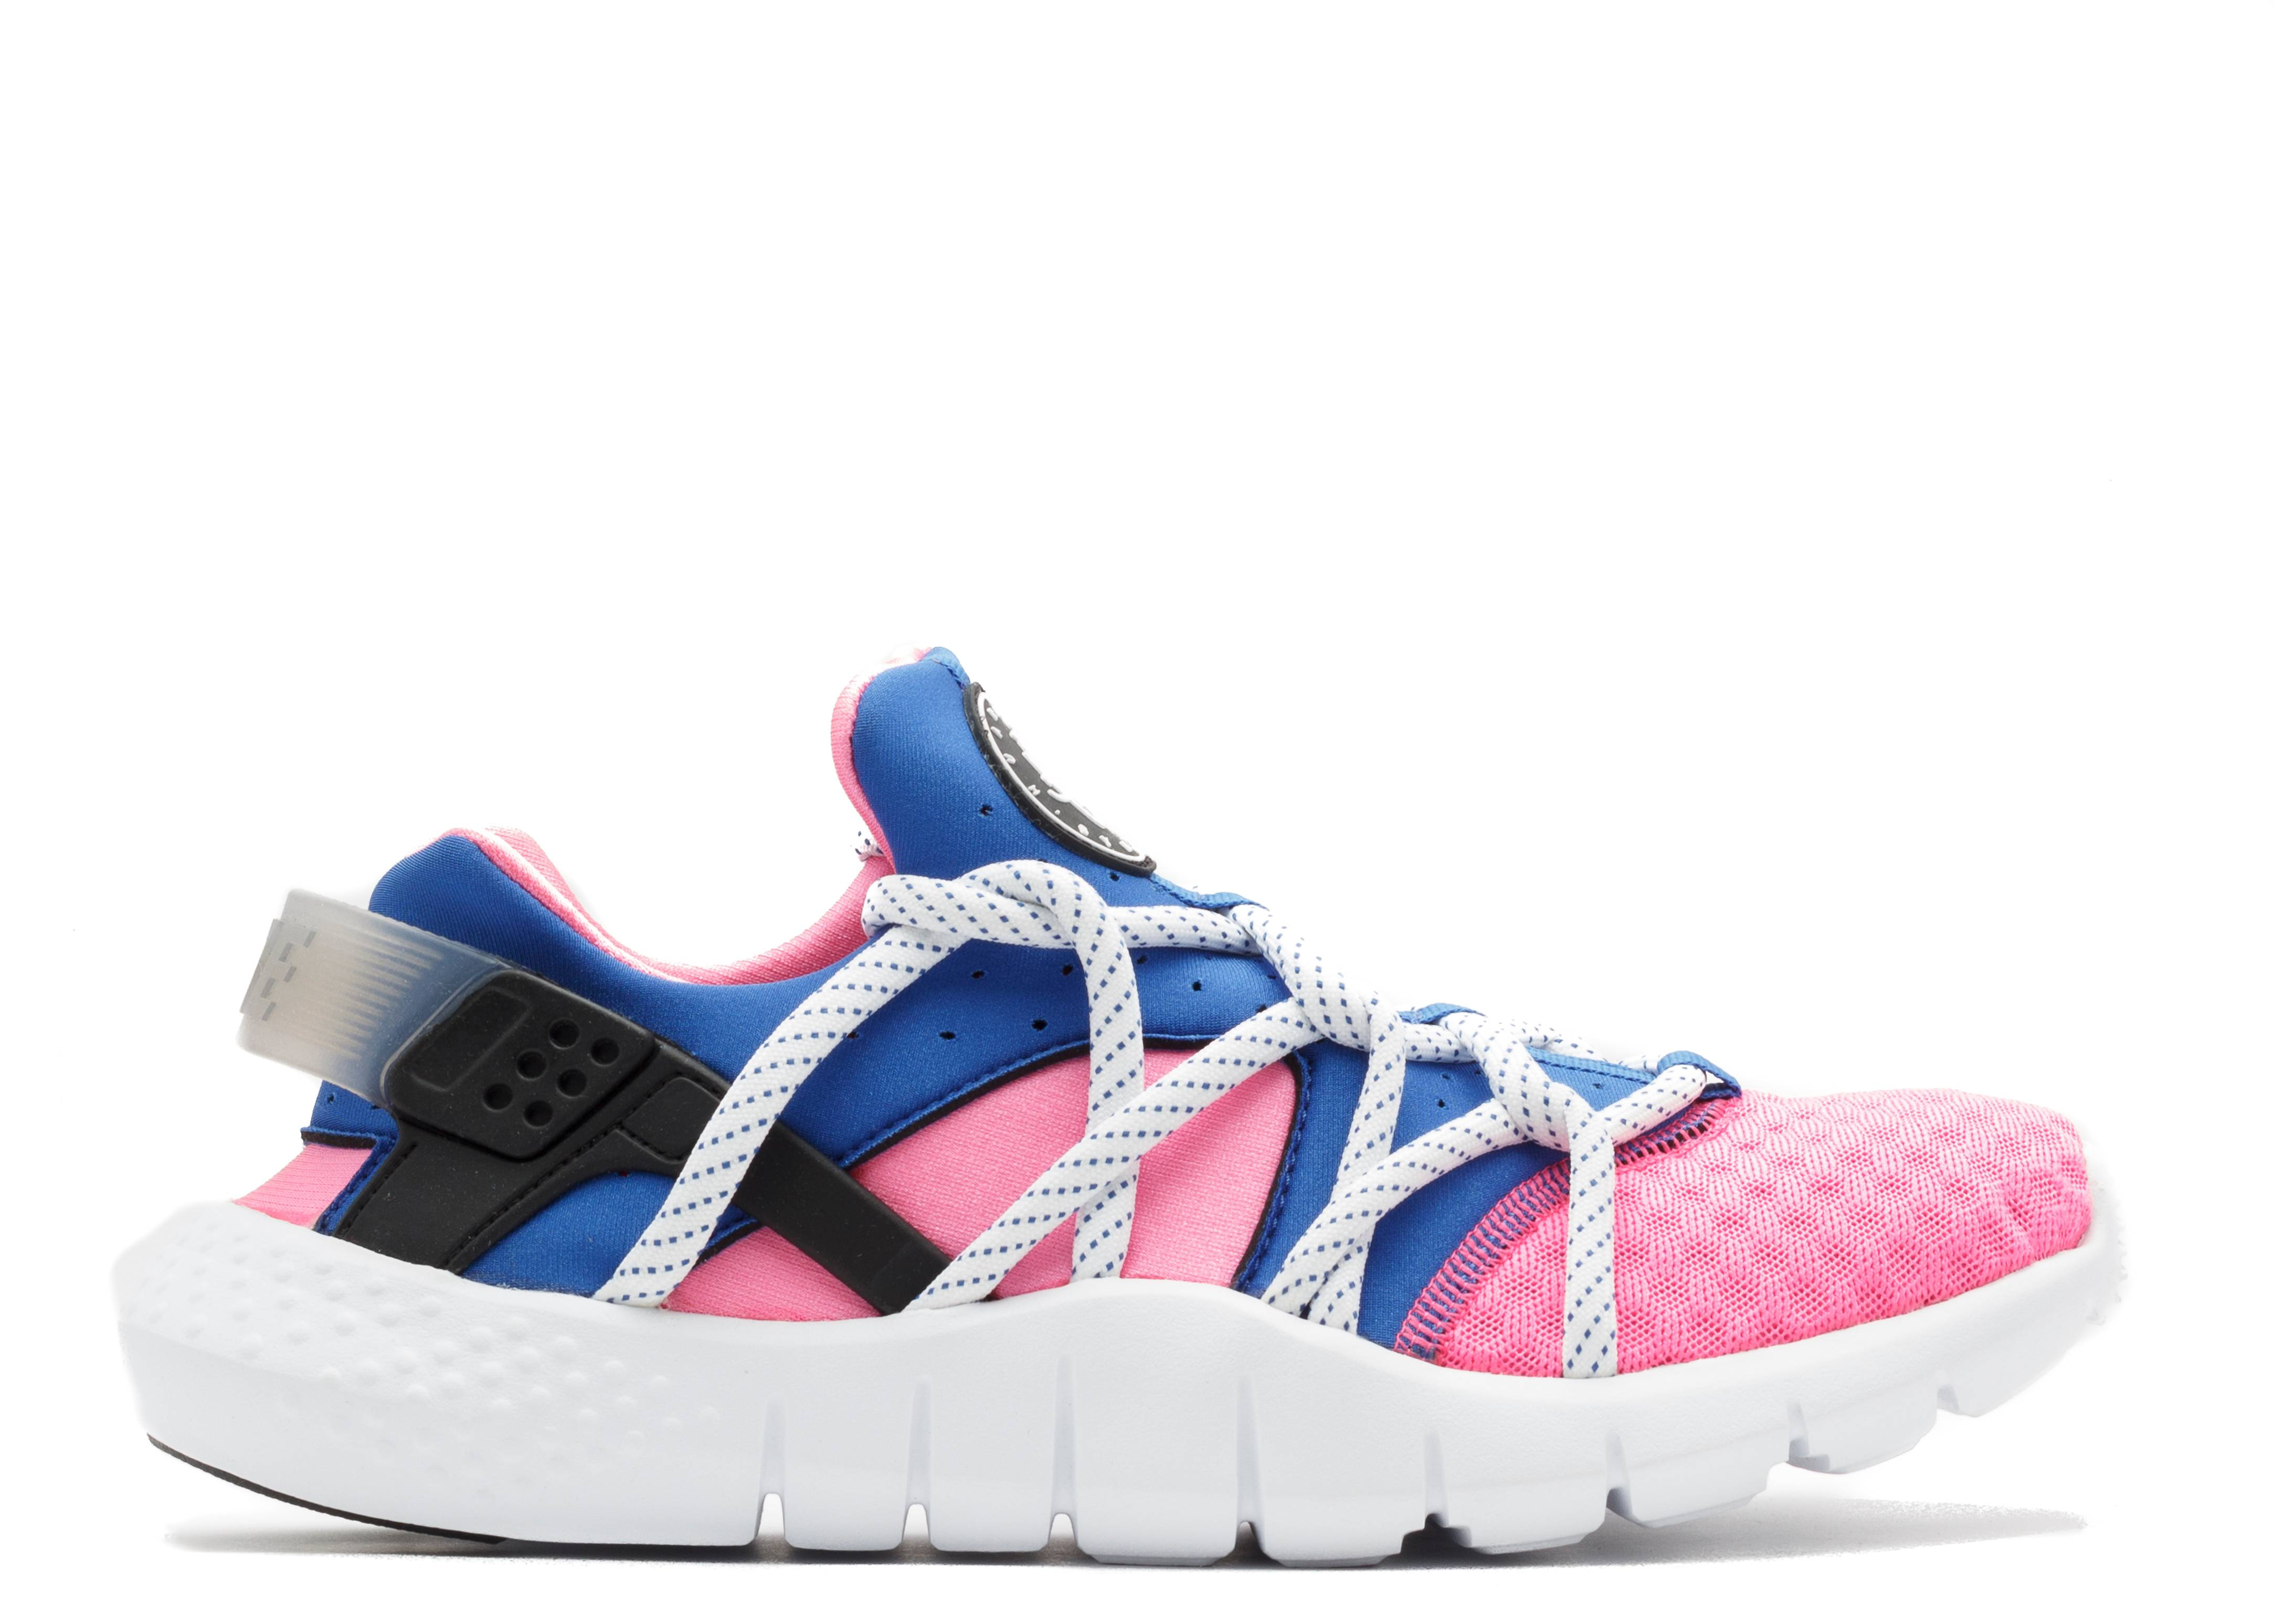 finest selection 9771f 3b4cd Huarache Nm - Nike - 705159 600 - pink powblack-game royal  Flight Club